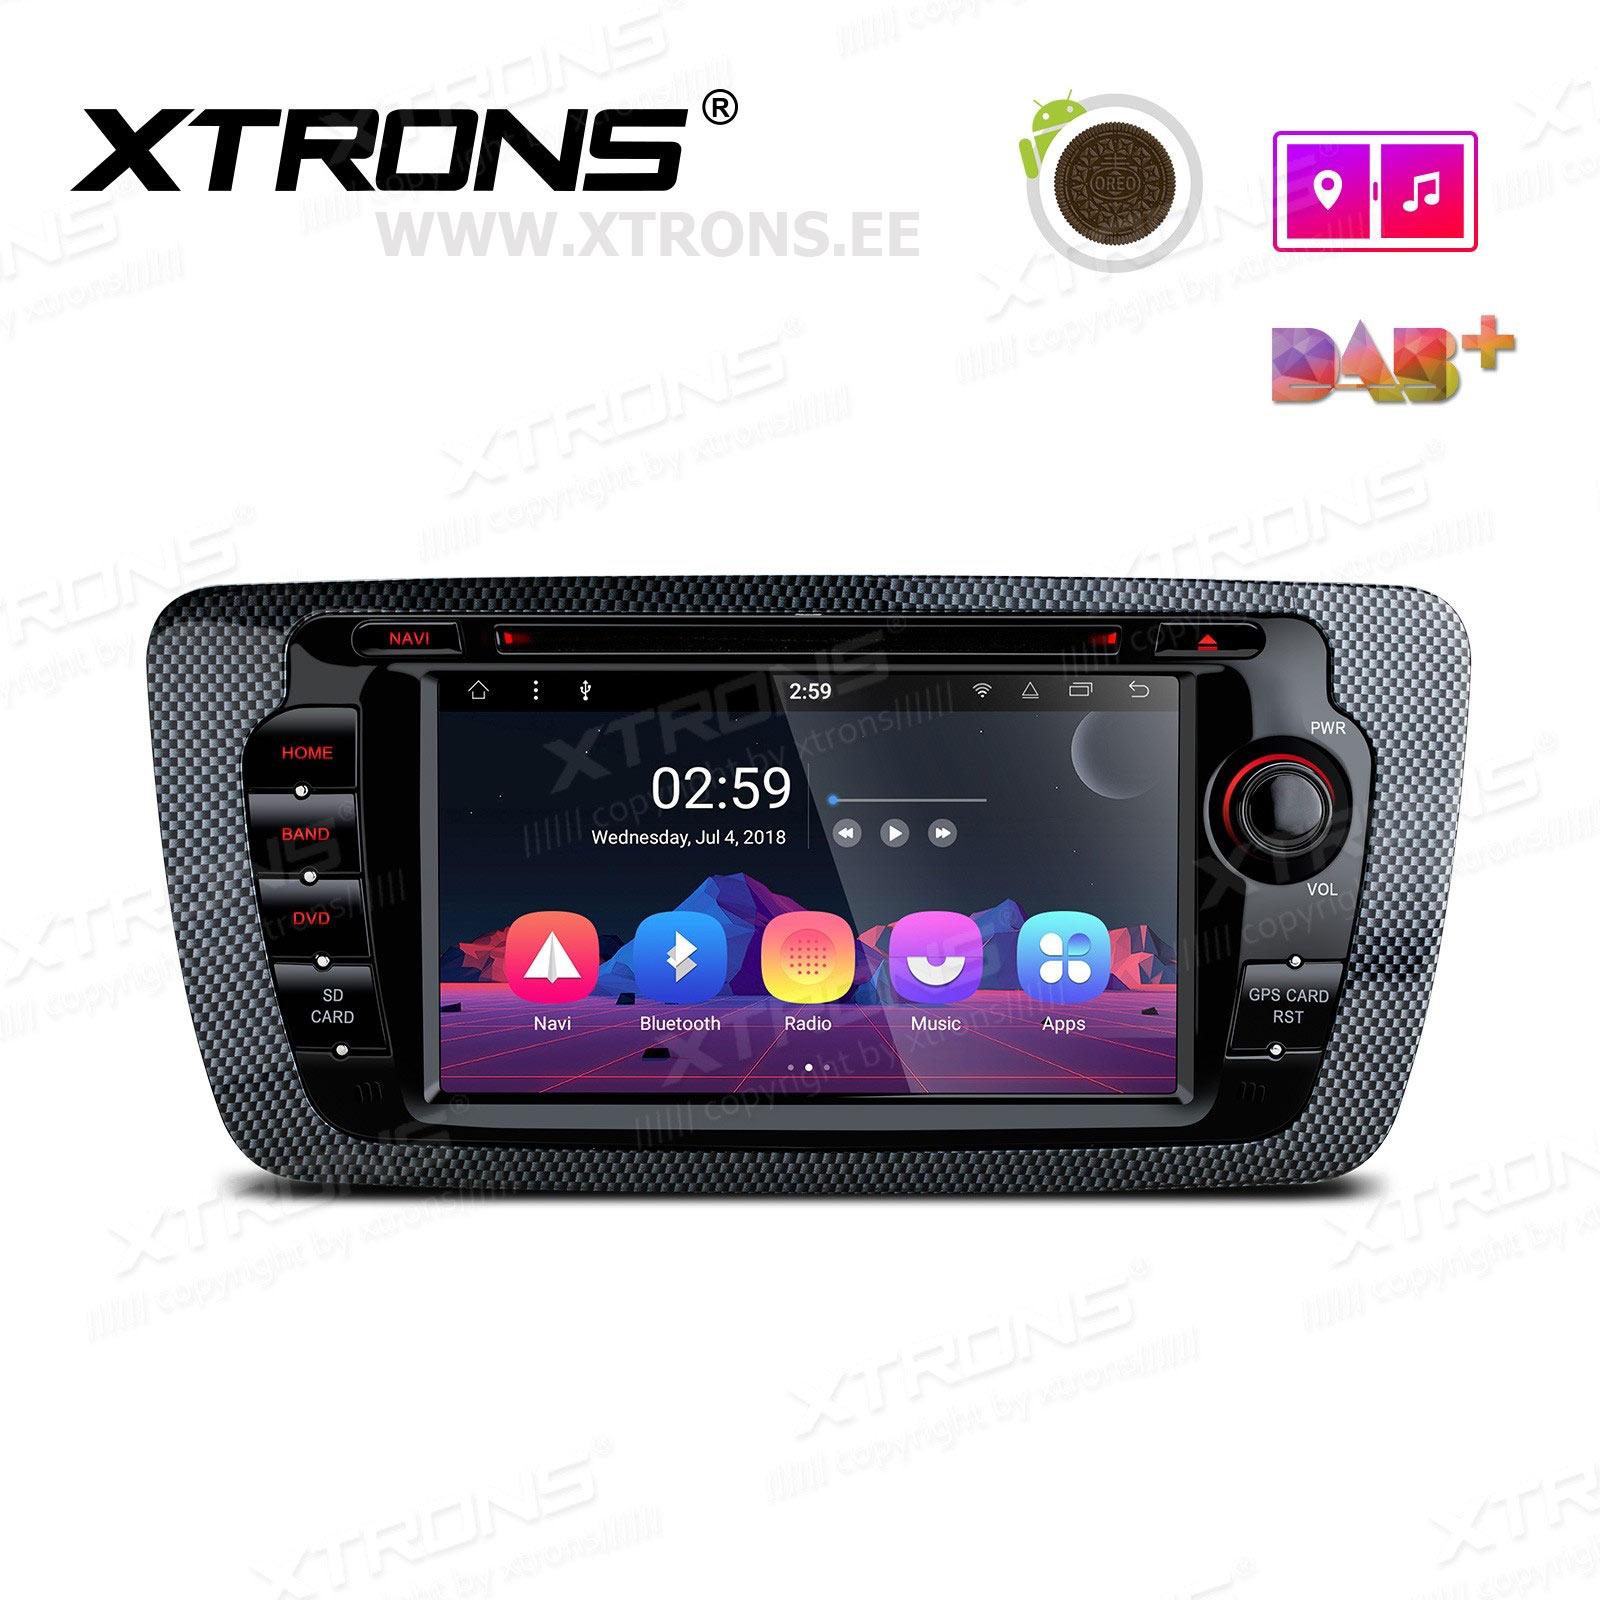 XTRONS PR78IBS